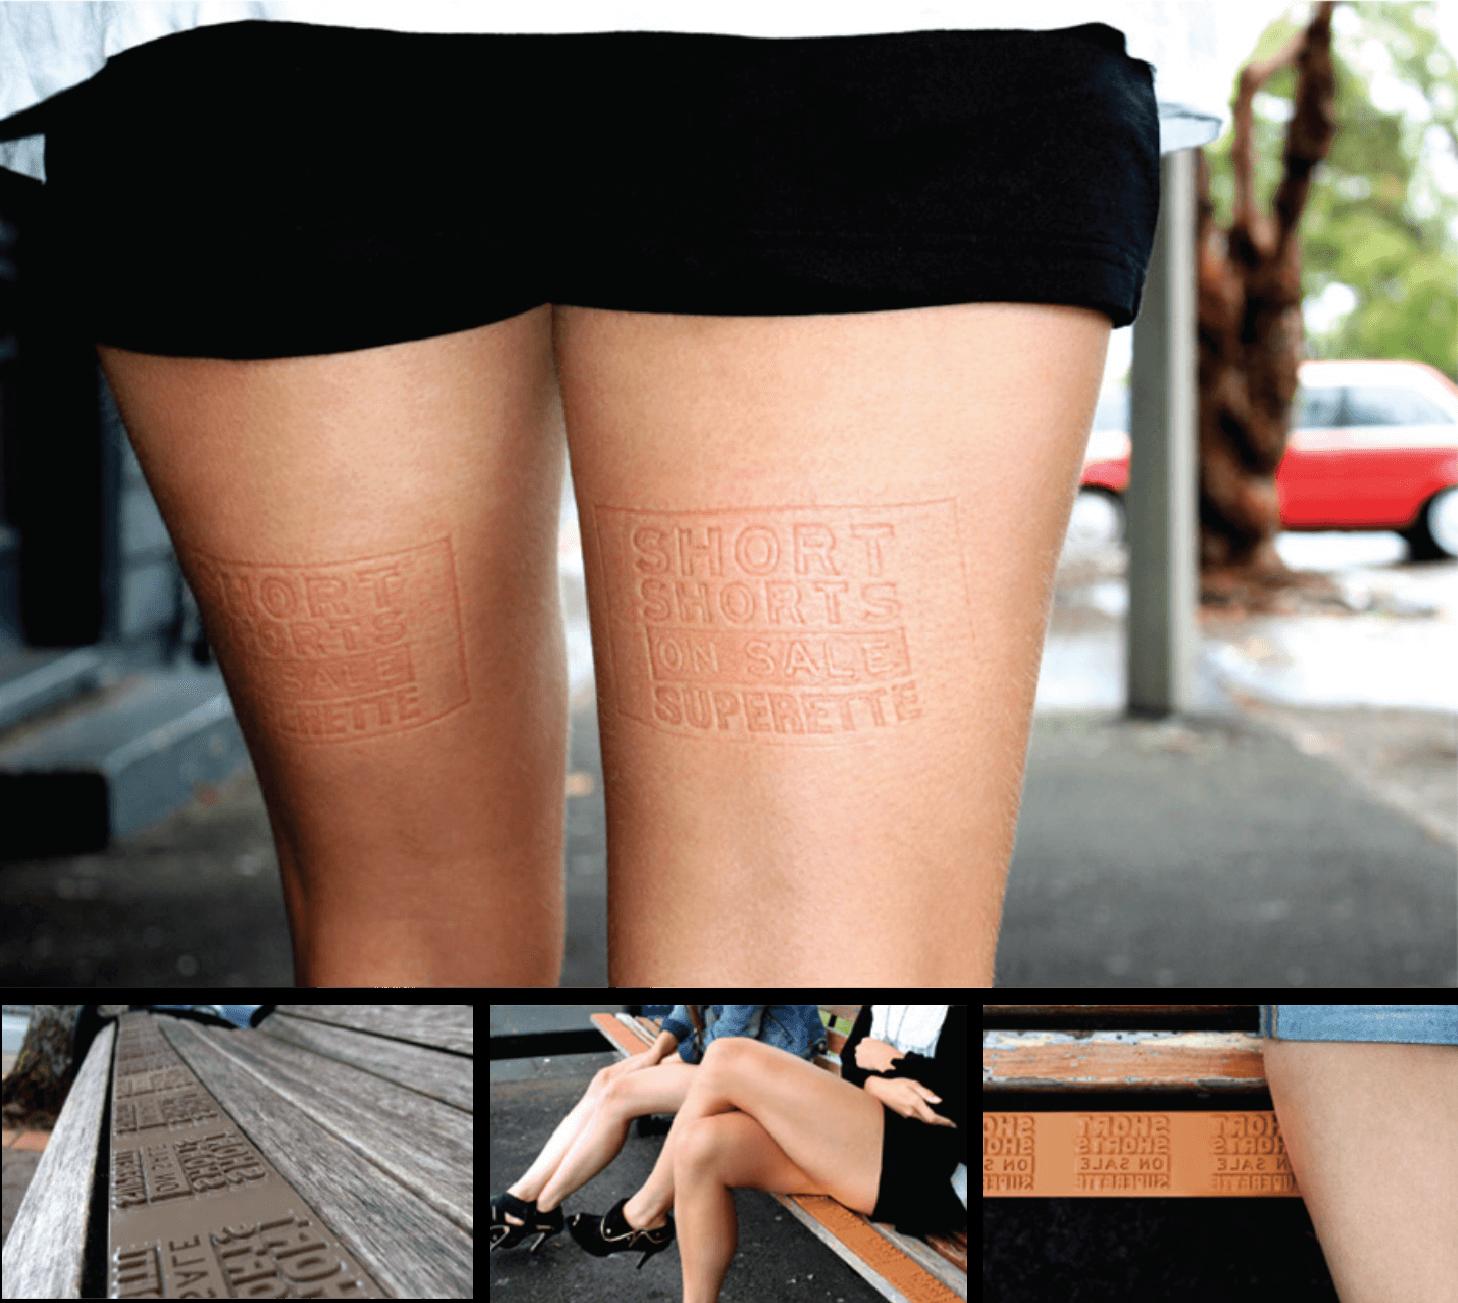 Short Shorts Leg Stamps - Superette